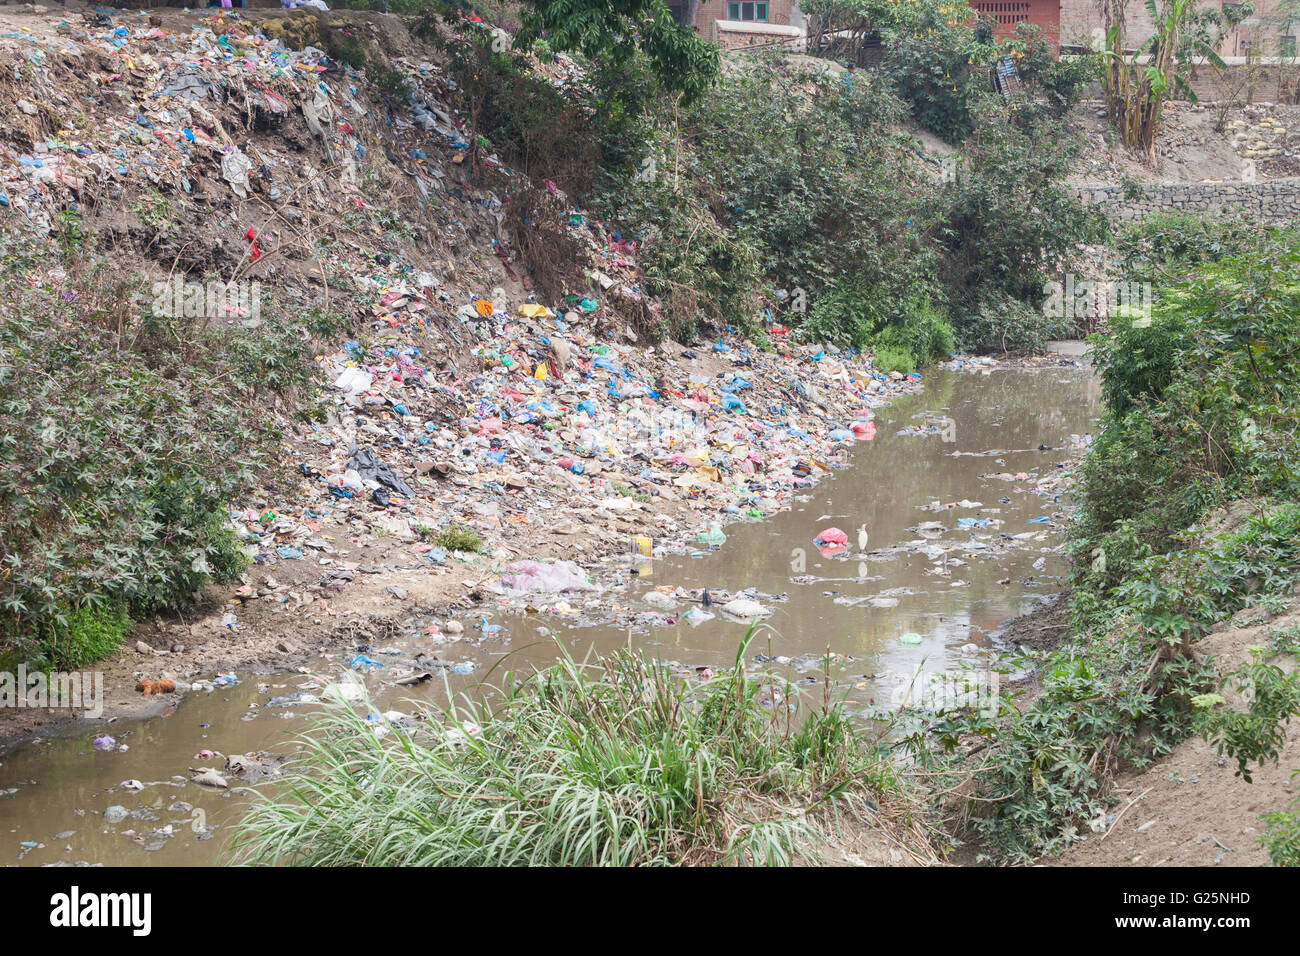 Rubbish dump along a river, Bhaktapur, Nepal - Stock Image